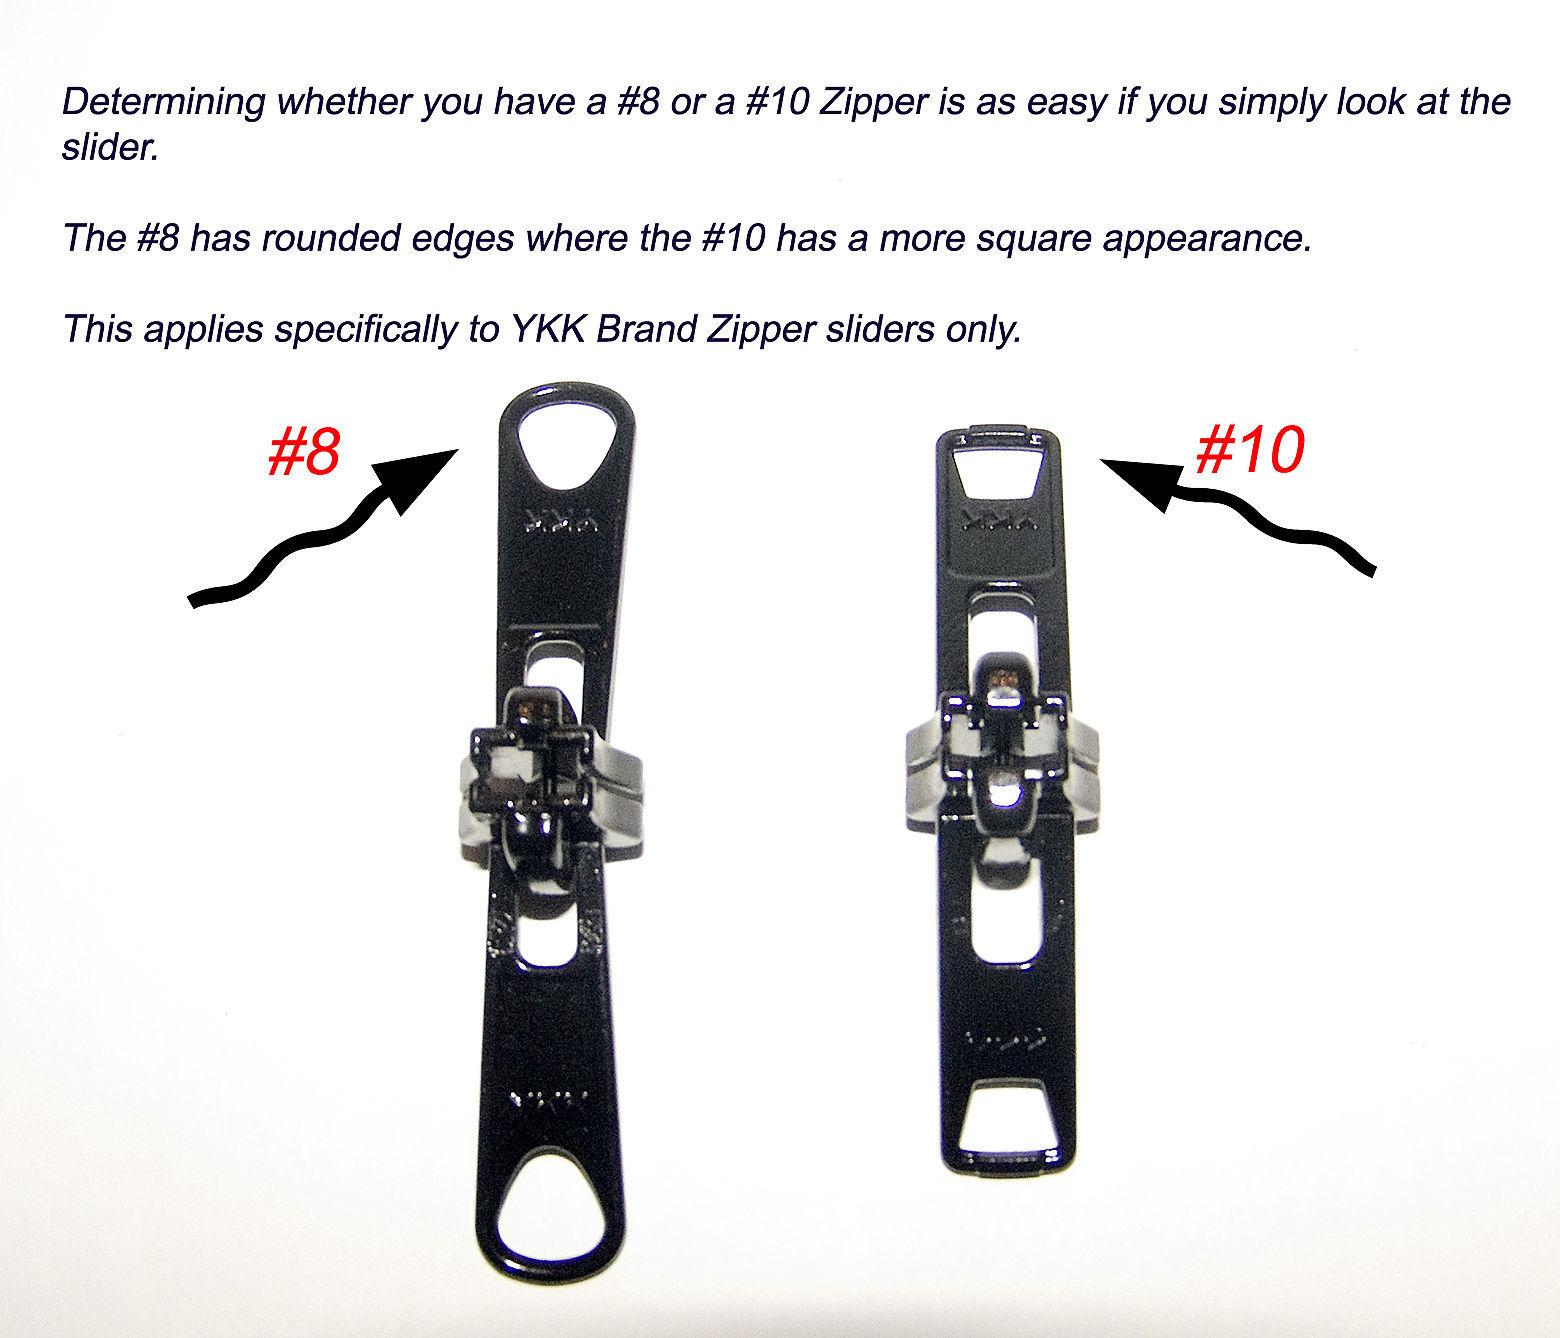 Zipper Slider, YKK Vislon, Double Metal Pull Tab, #8, White, 2 Pc. image 4